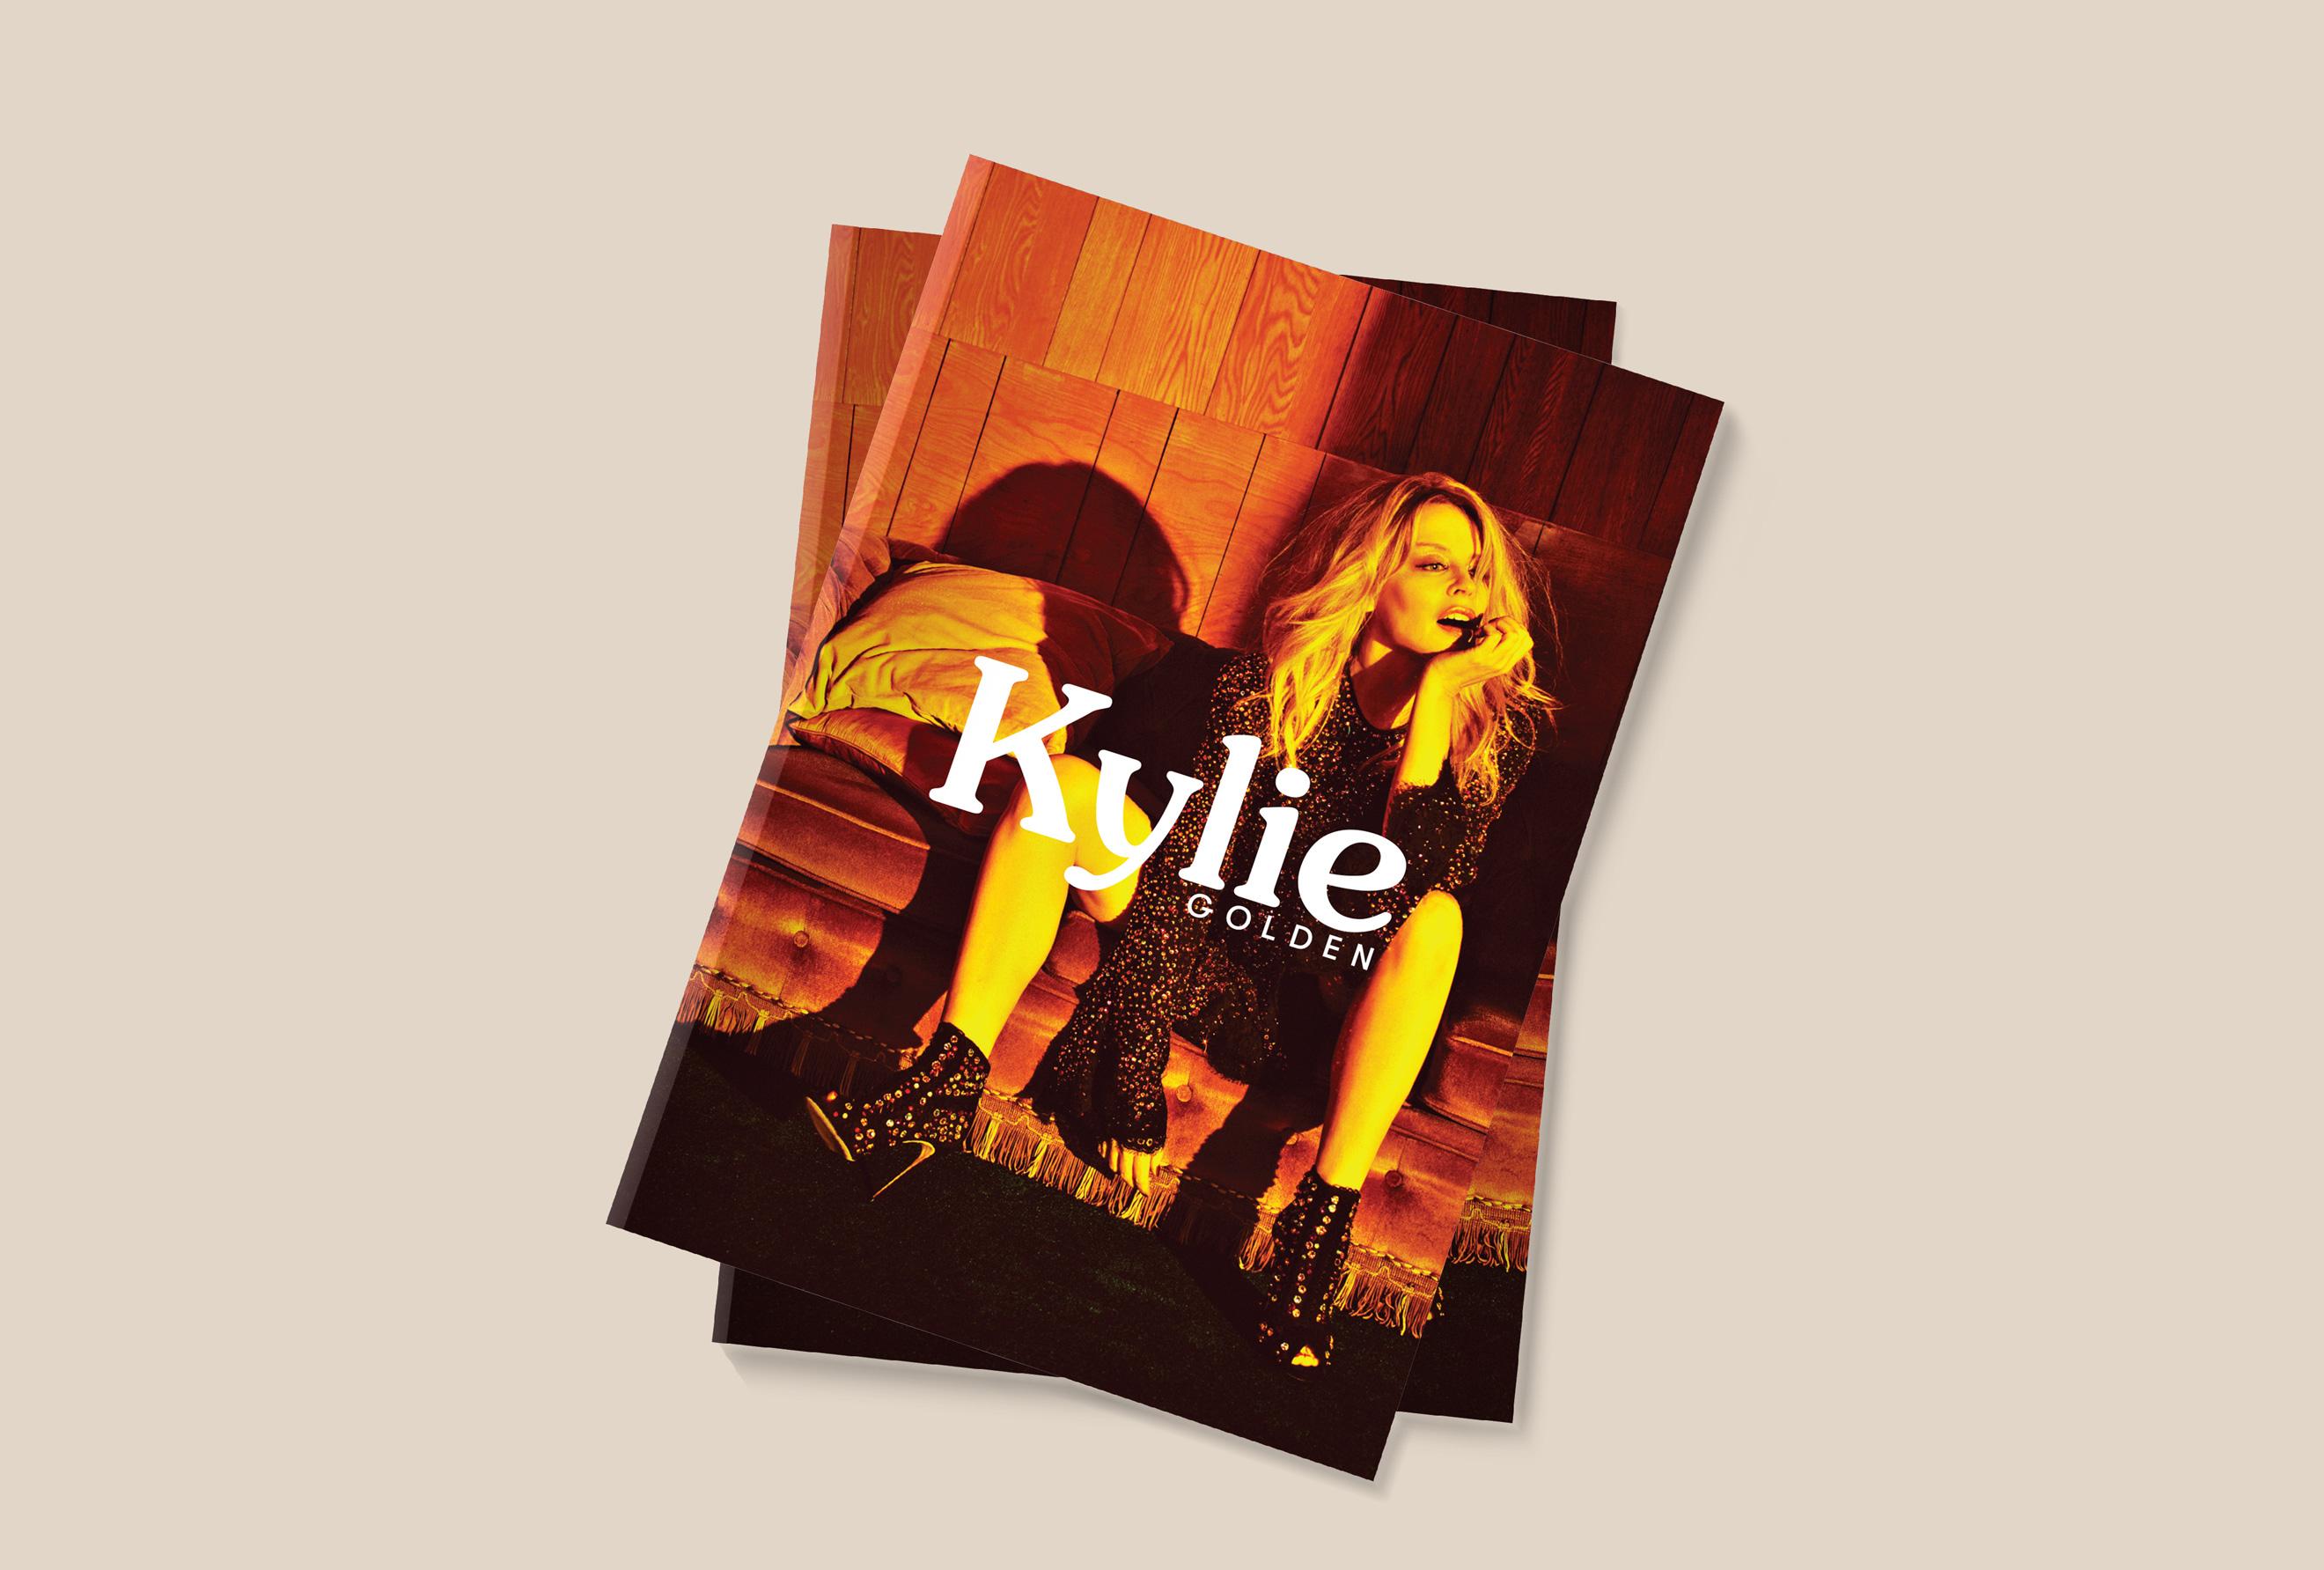 Kylie Minogue – Golden - Studio – Leif Podhajsky